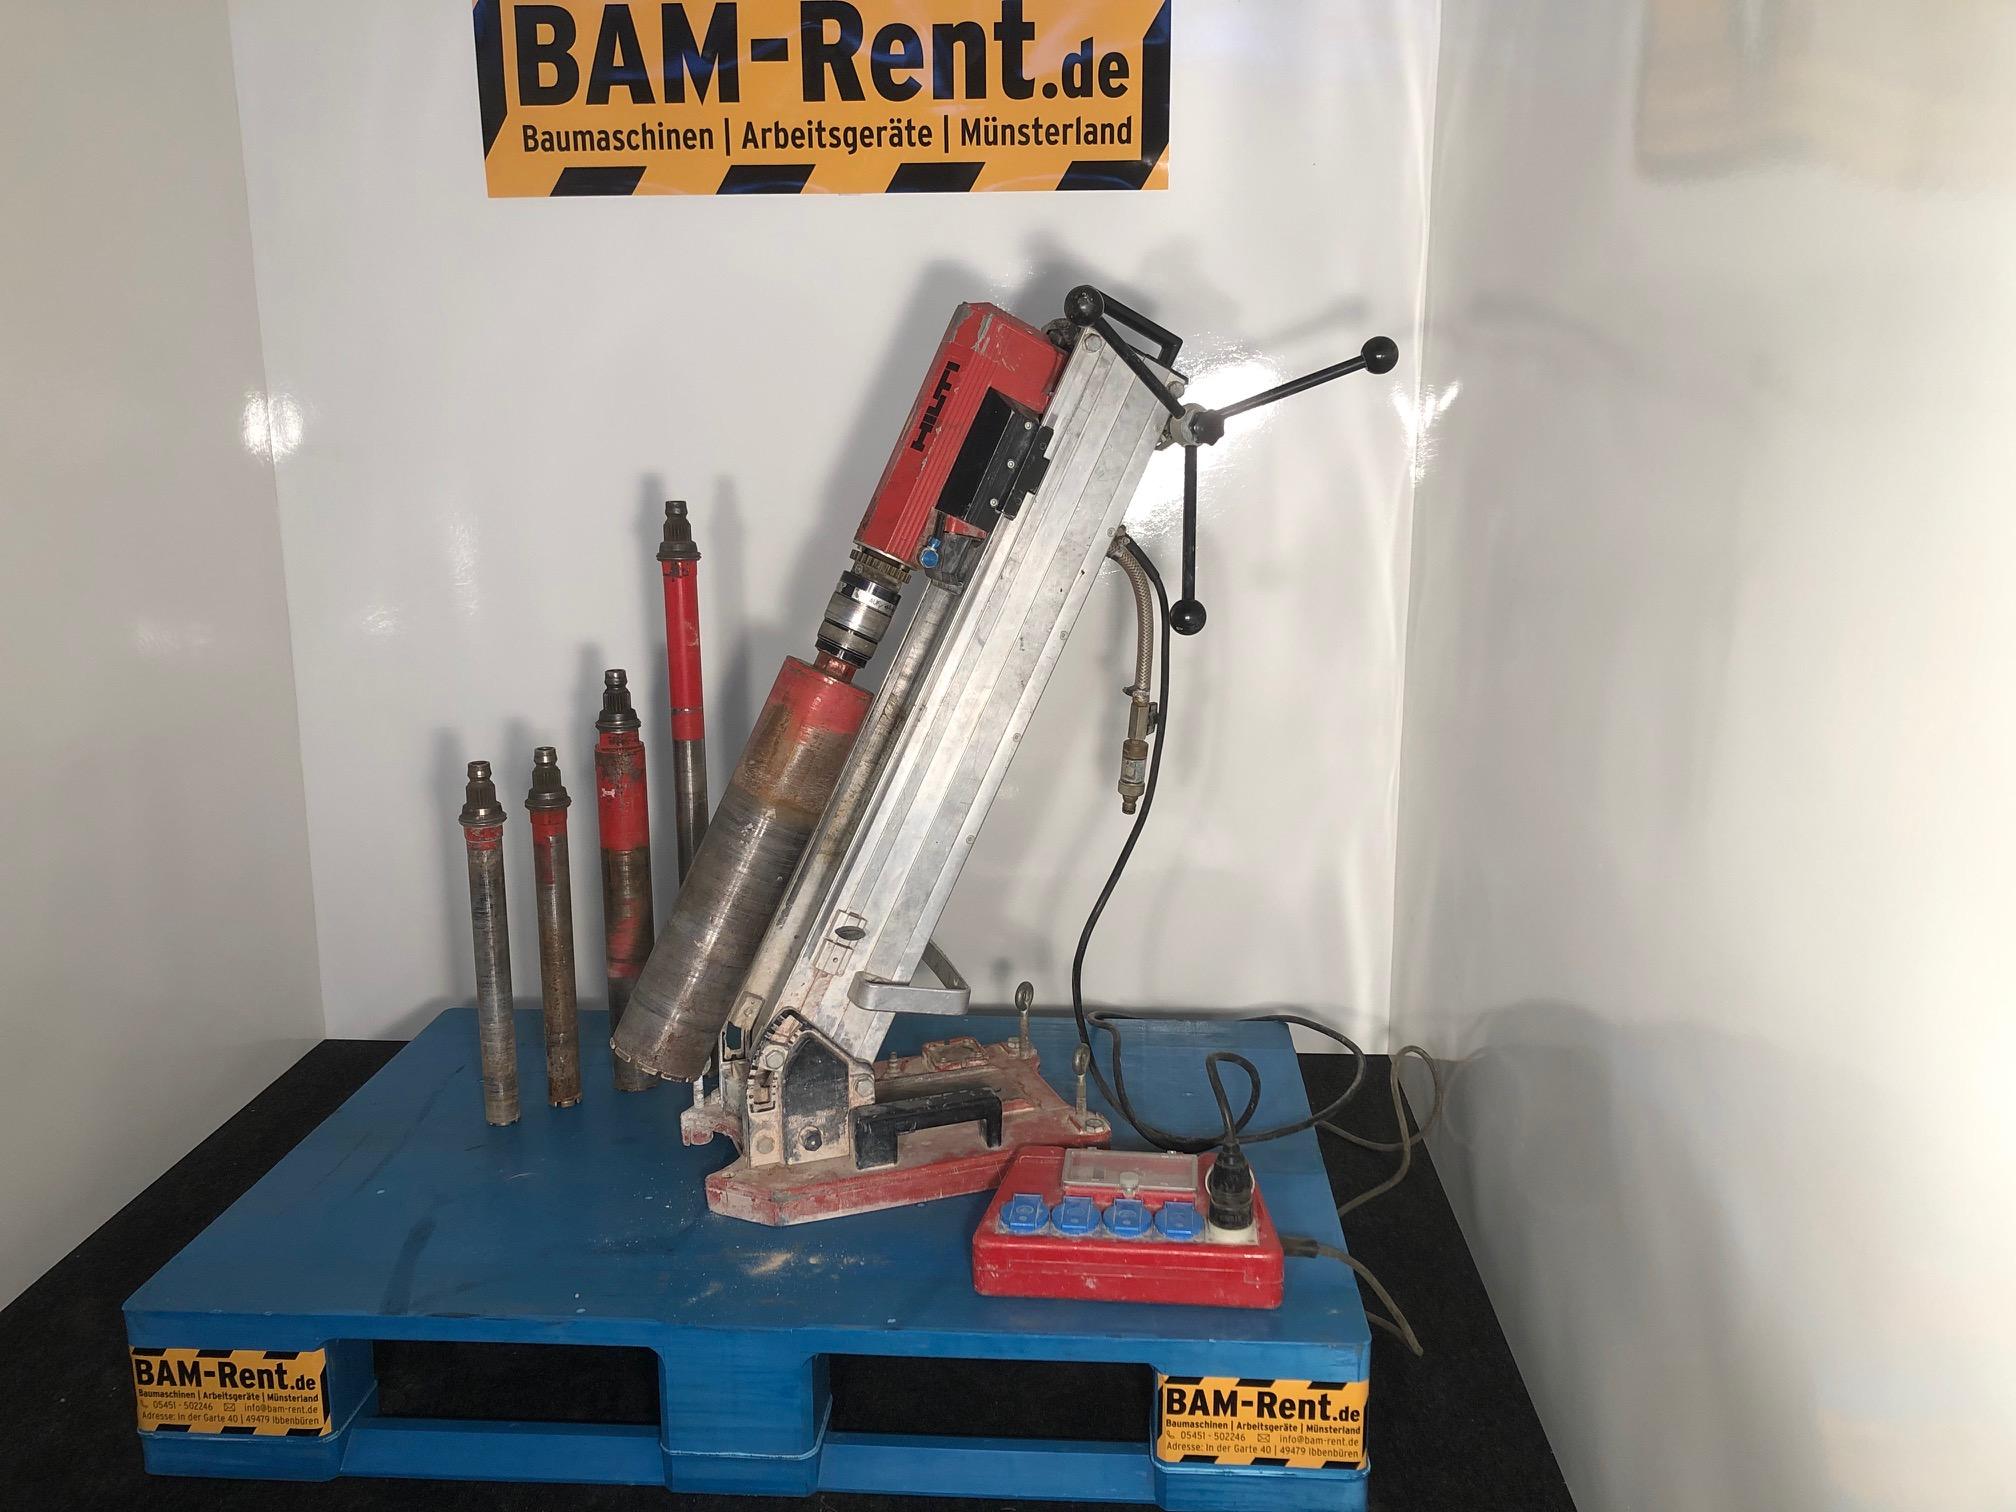 BAM-B0080 Hilti Diamantbohrgerät Kernbohrgerät mieten Ibbenbüren